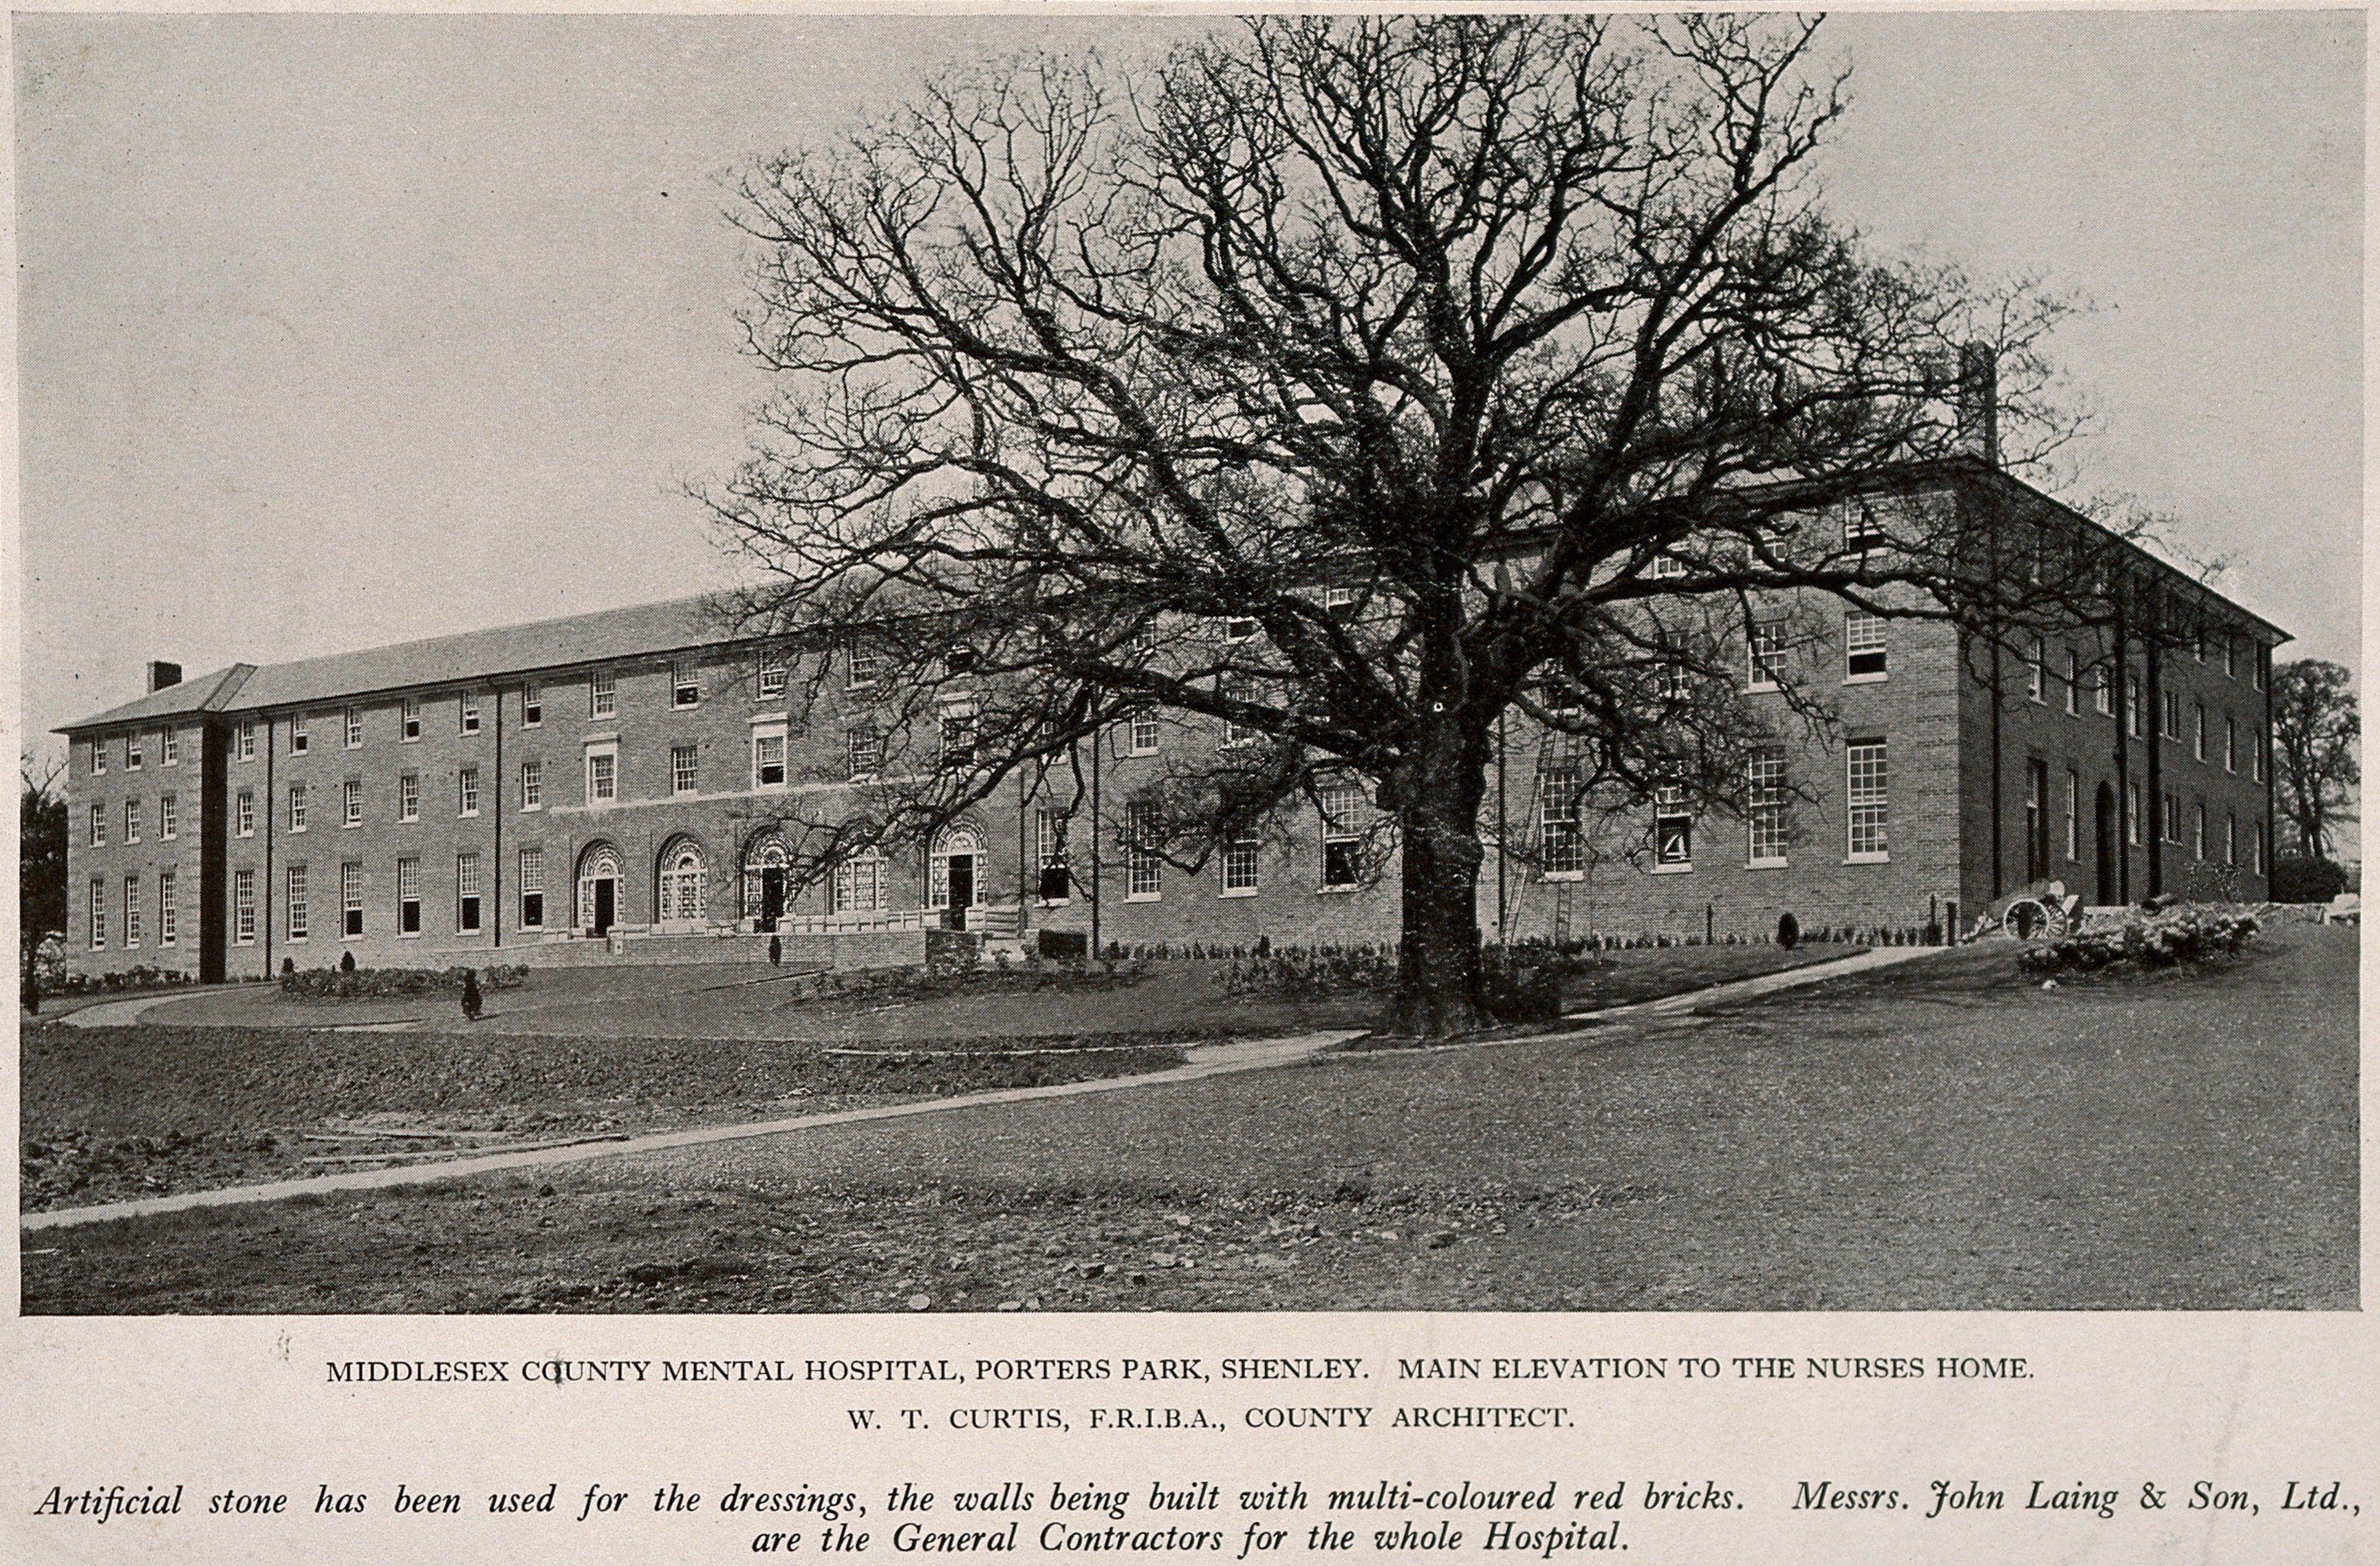 Middlesex County Mental Hospital, Porters Park, Shenley